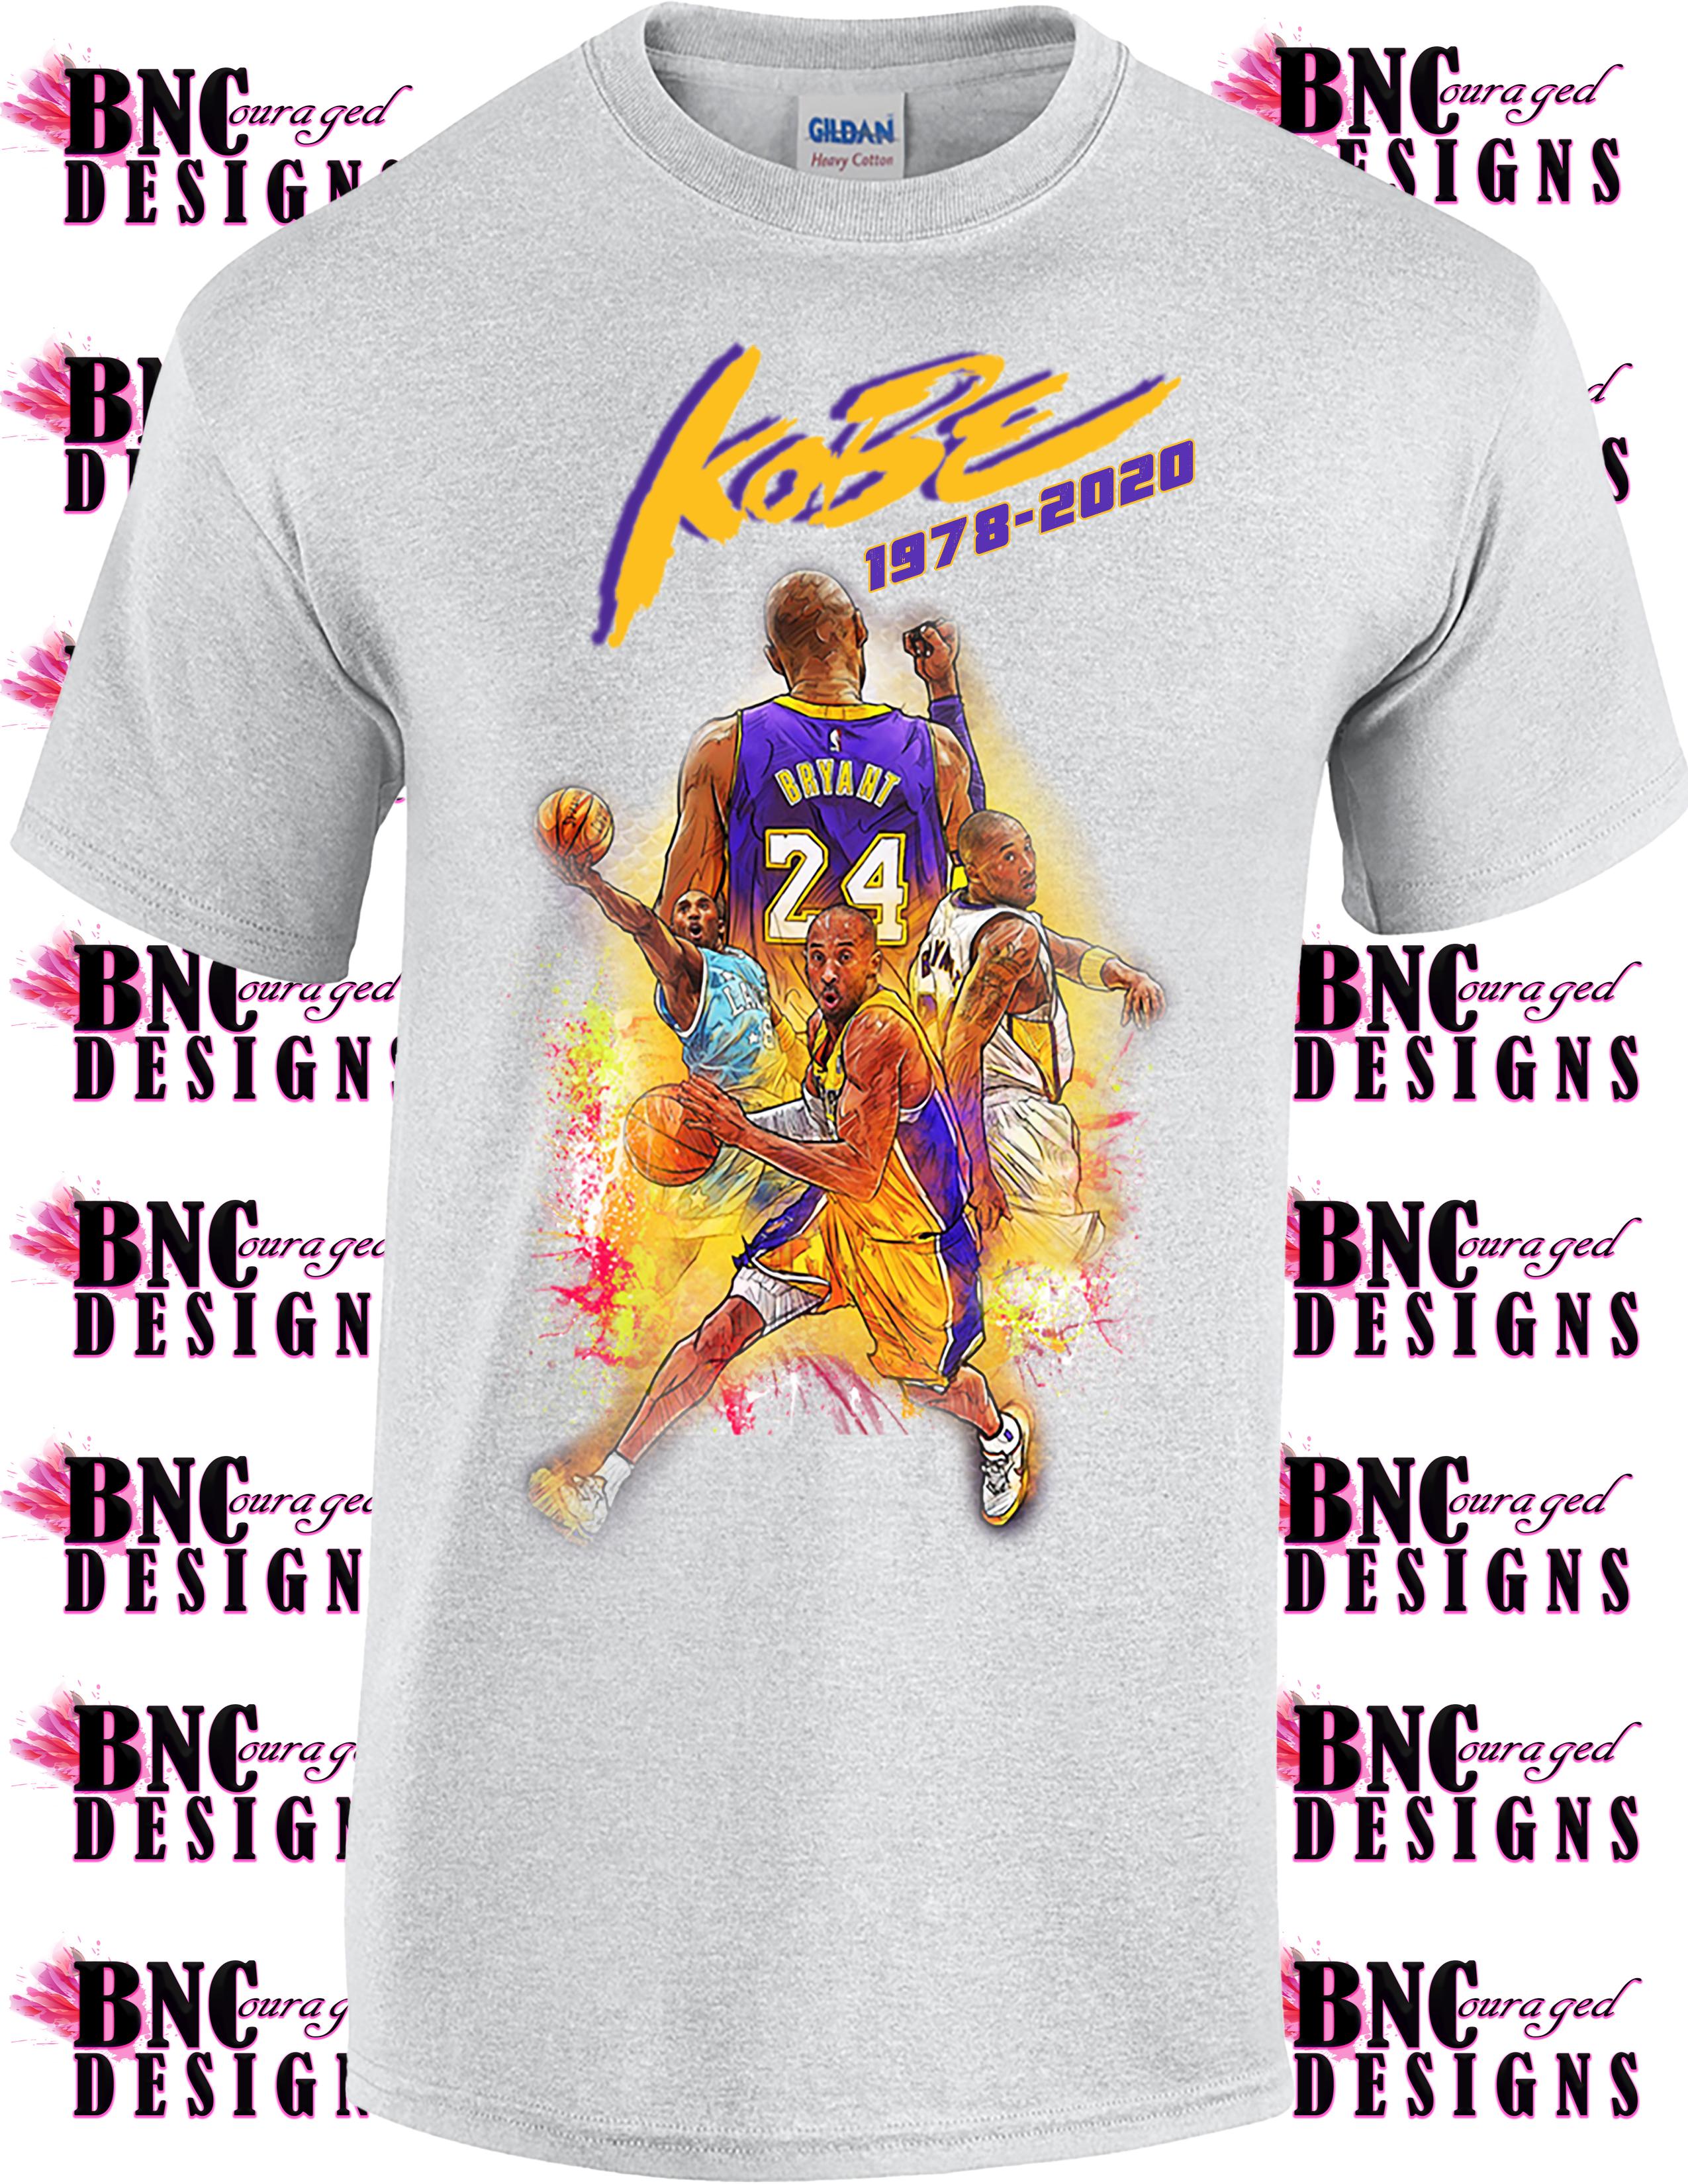 Kobe Tshirt Design